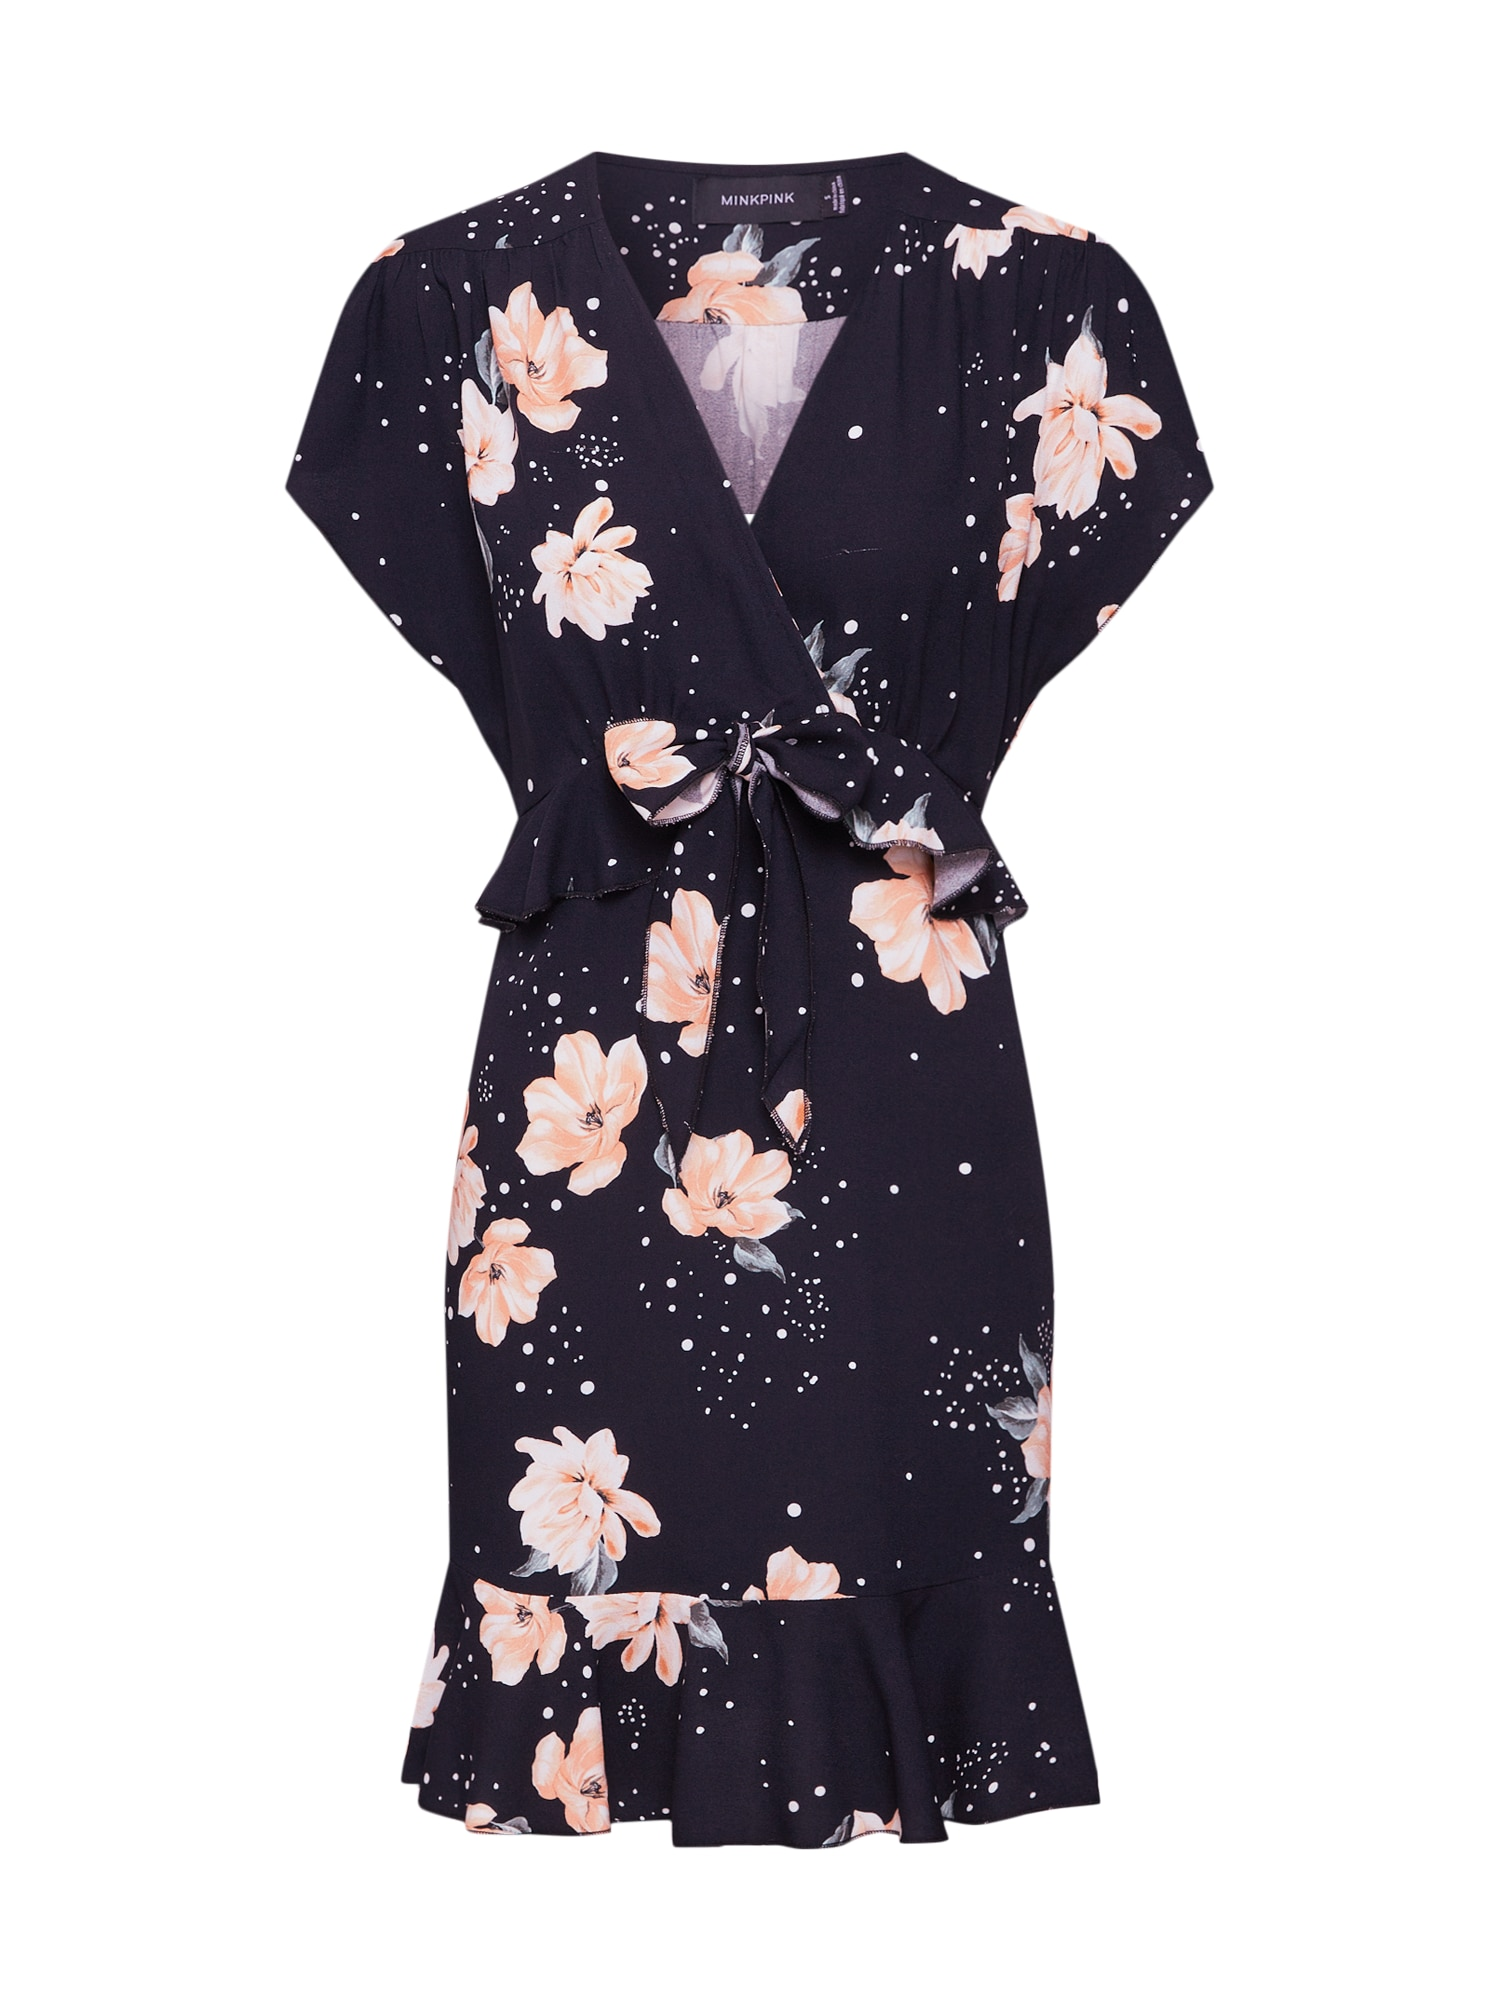 Šaty TANGERINE DREAM broskvová černá MINKPINK